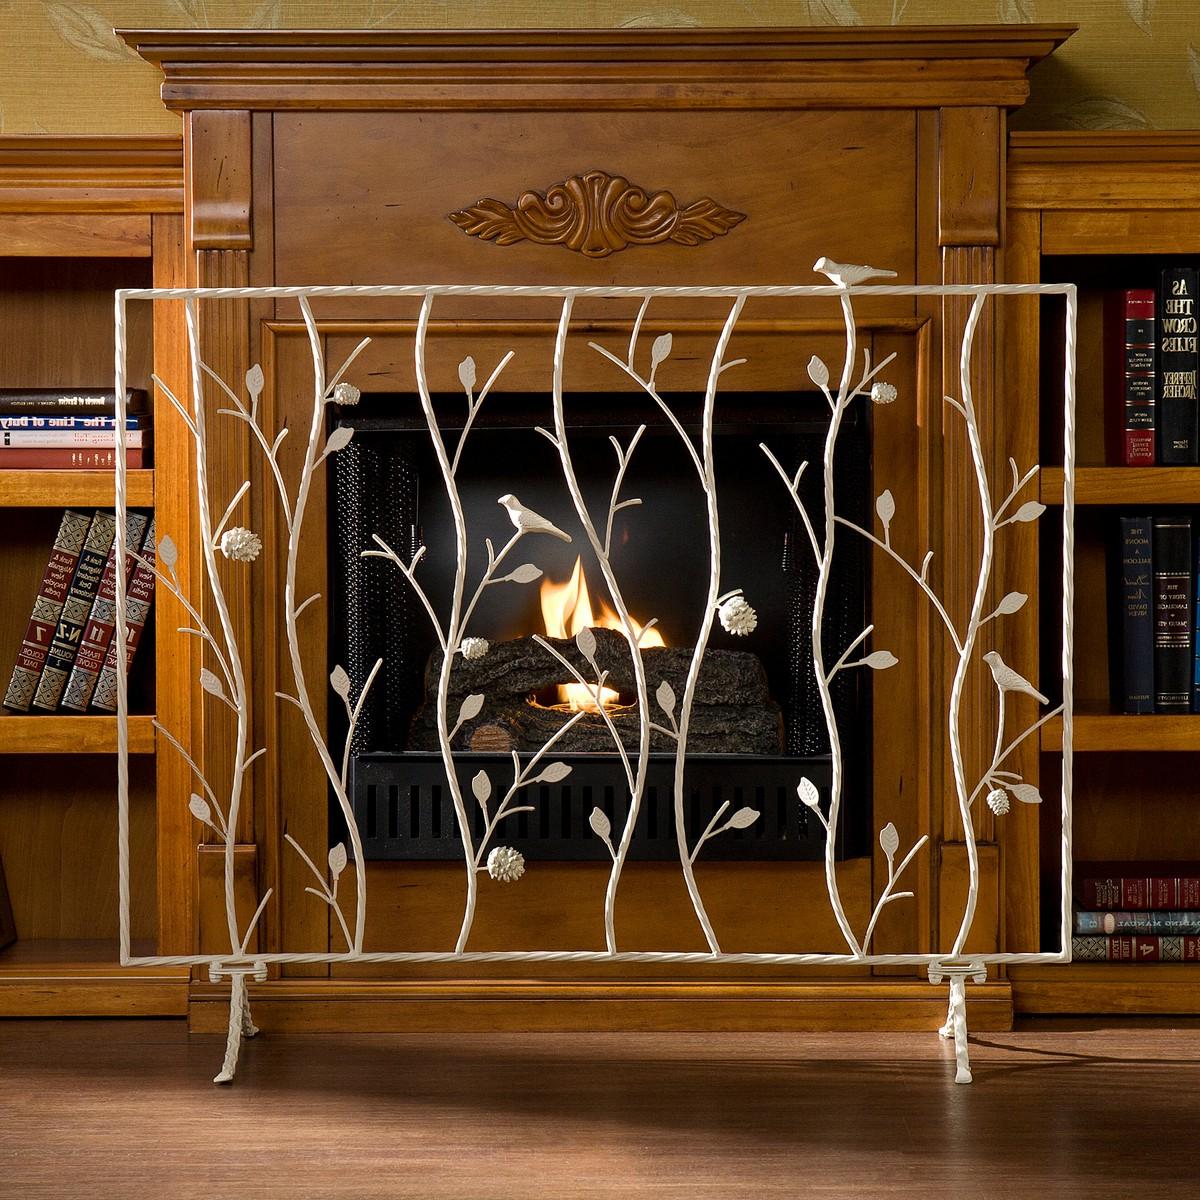 ebay fireplace screen on custom fireplace quality black mesh curtain fireplace screen curtain fireplace screen or curtain